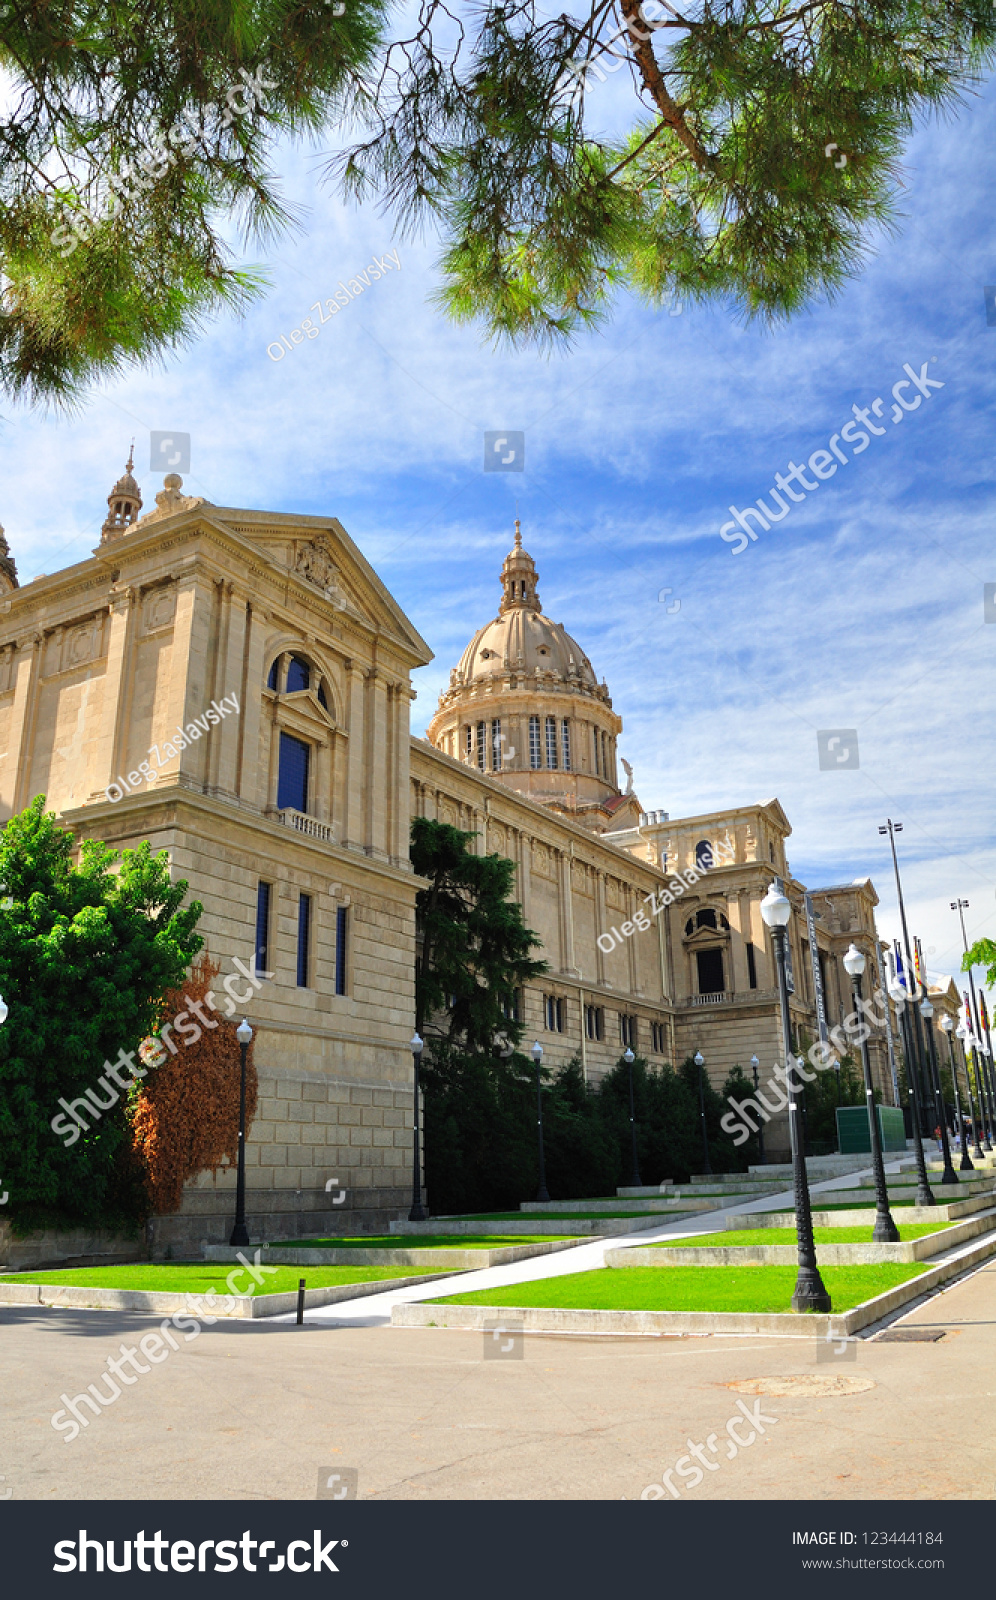 National art museum of catalonia barcelona stock photo for Artiste peintre catalan